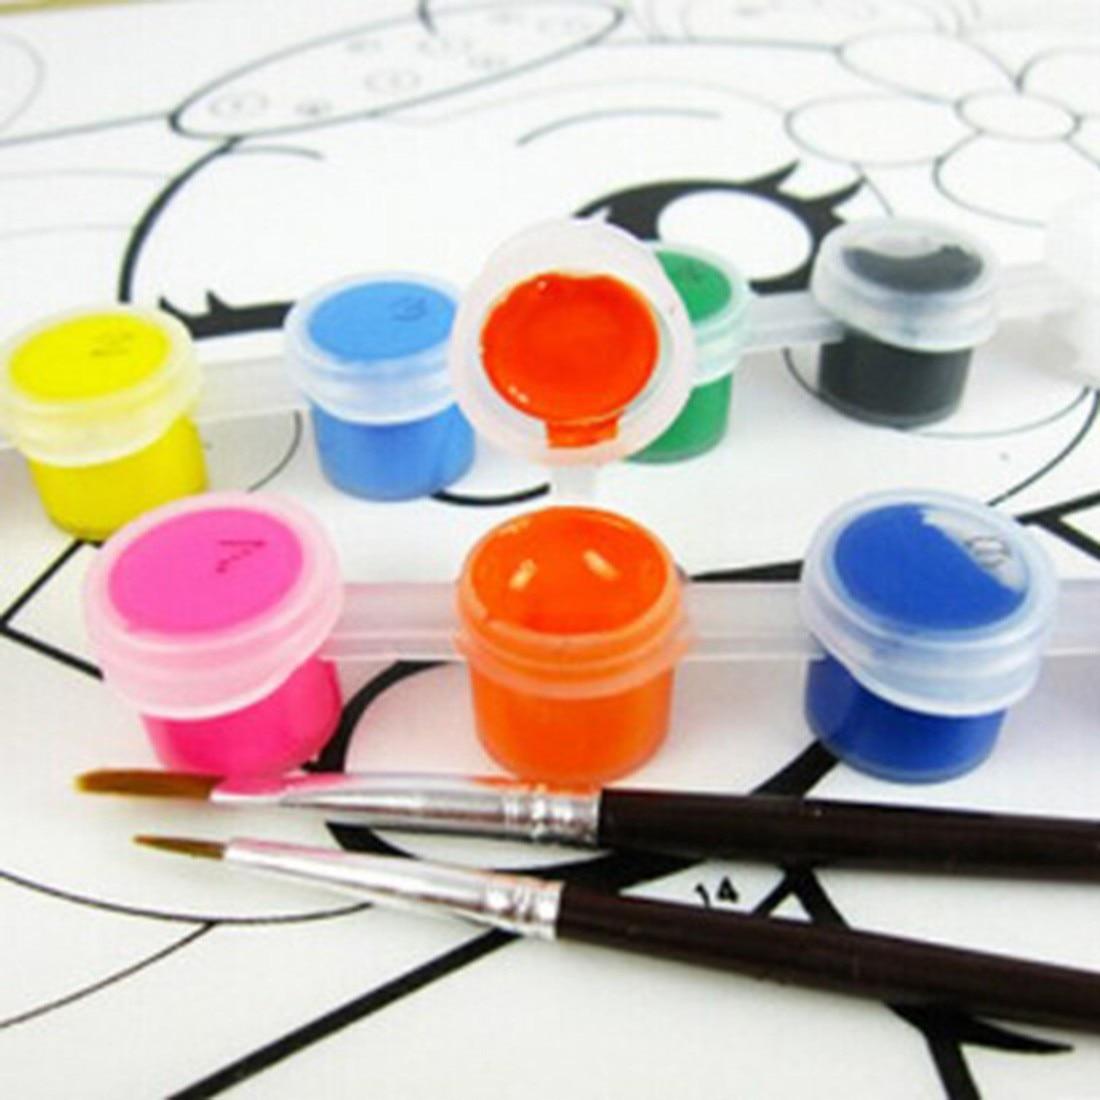 12 Colors With 2 Paint Blue Brushes Per Set Acrylic Paints For Oil Painting Nail Art Clothes Art Digital Random Color